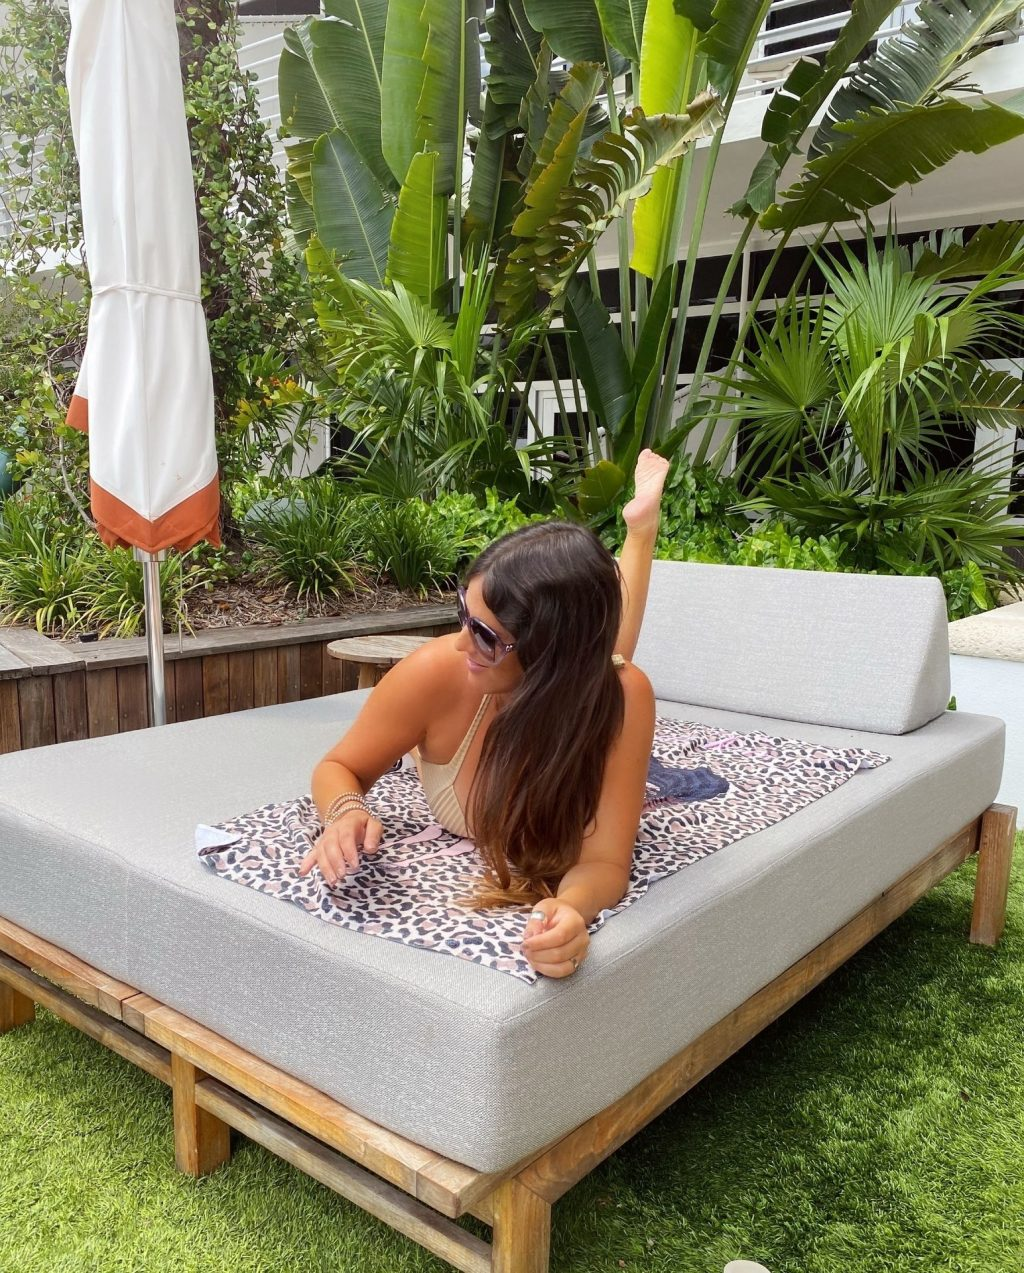 Claudia Romani Poses at The Ritz Carlton Hotel in Miami Beach (12 Photos)